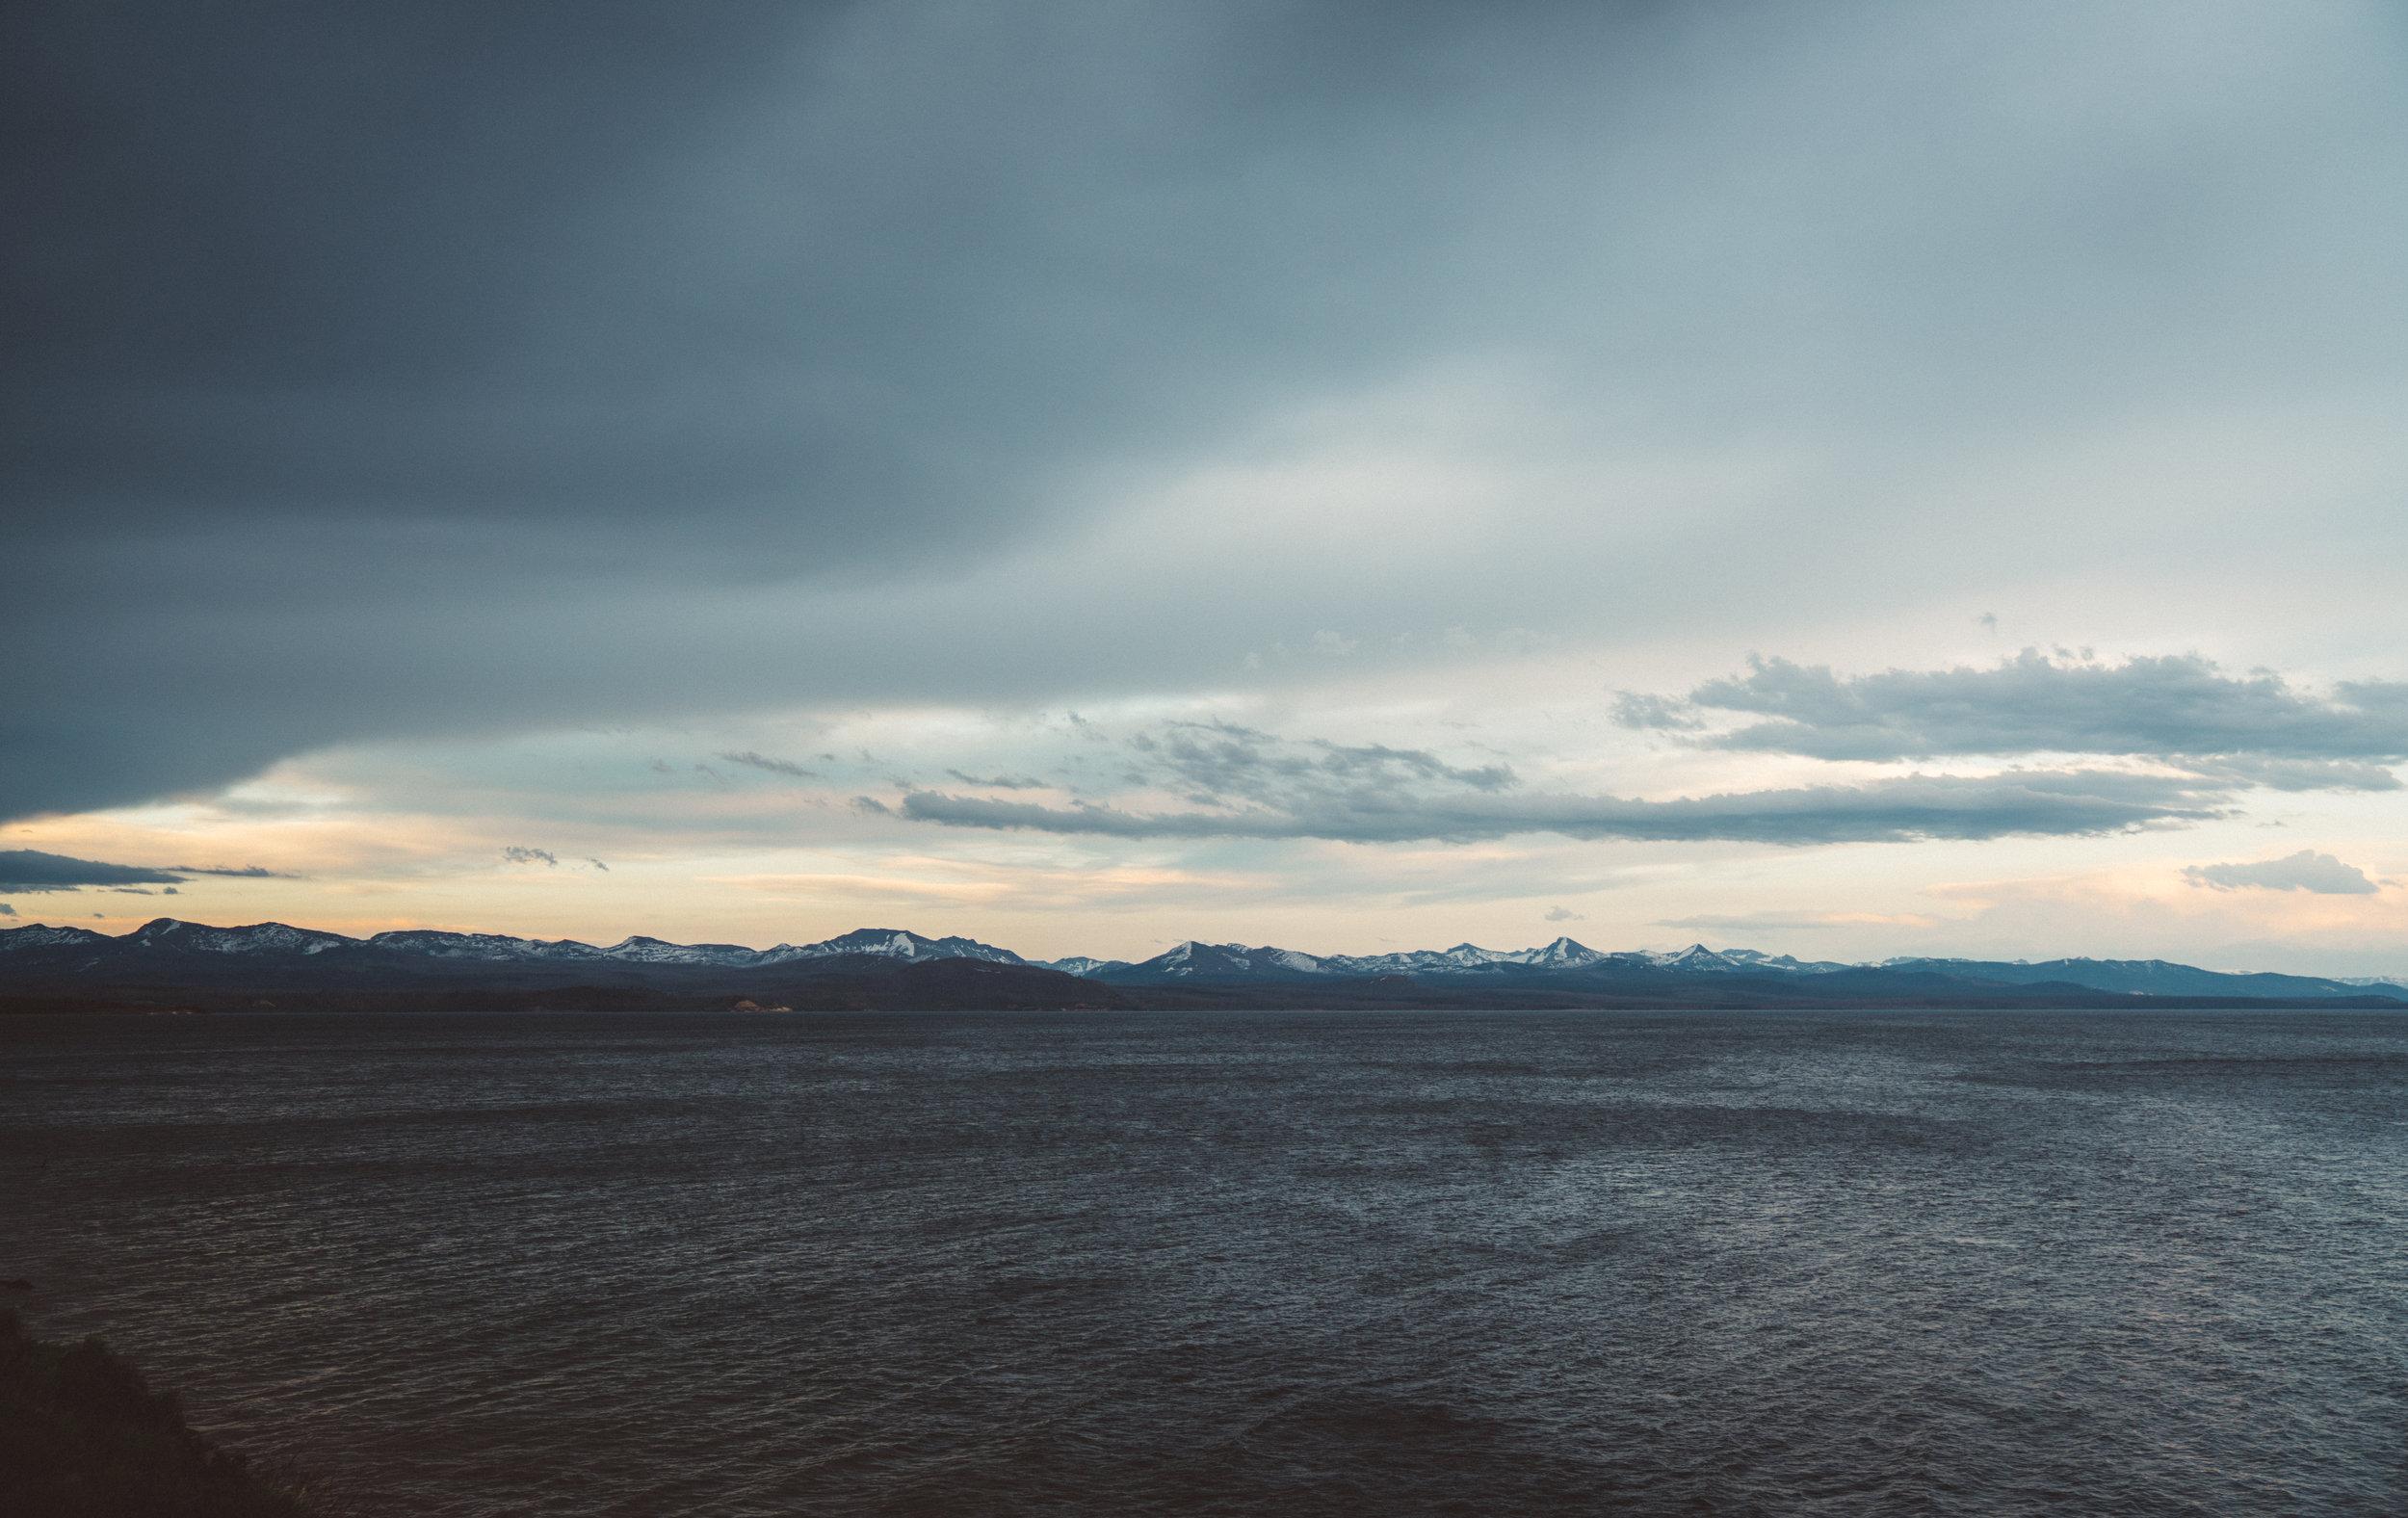 The rain broke as we arrived at Yellowstone Lake.